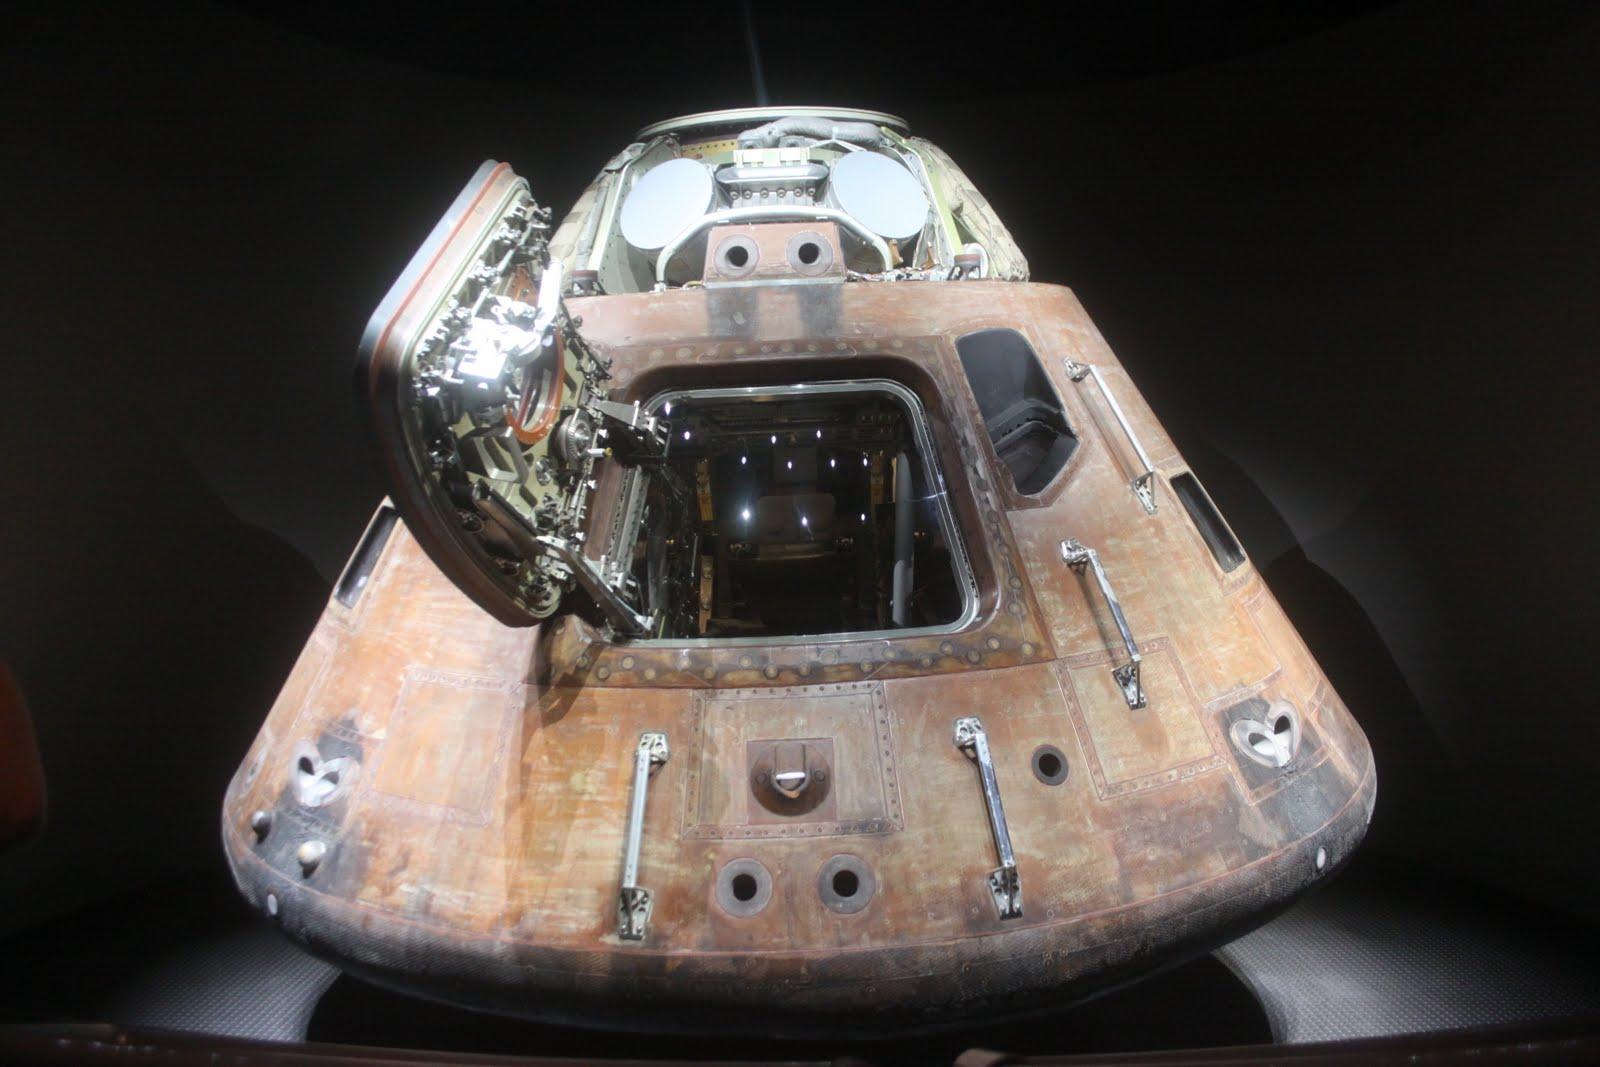 apollo 3 capsule - photo #8